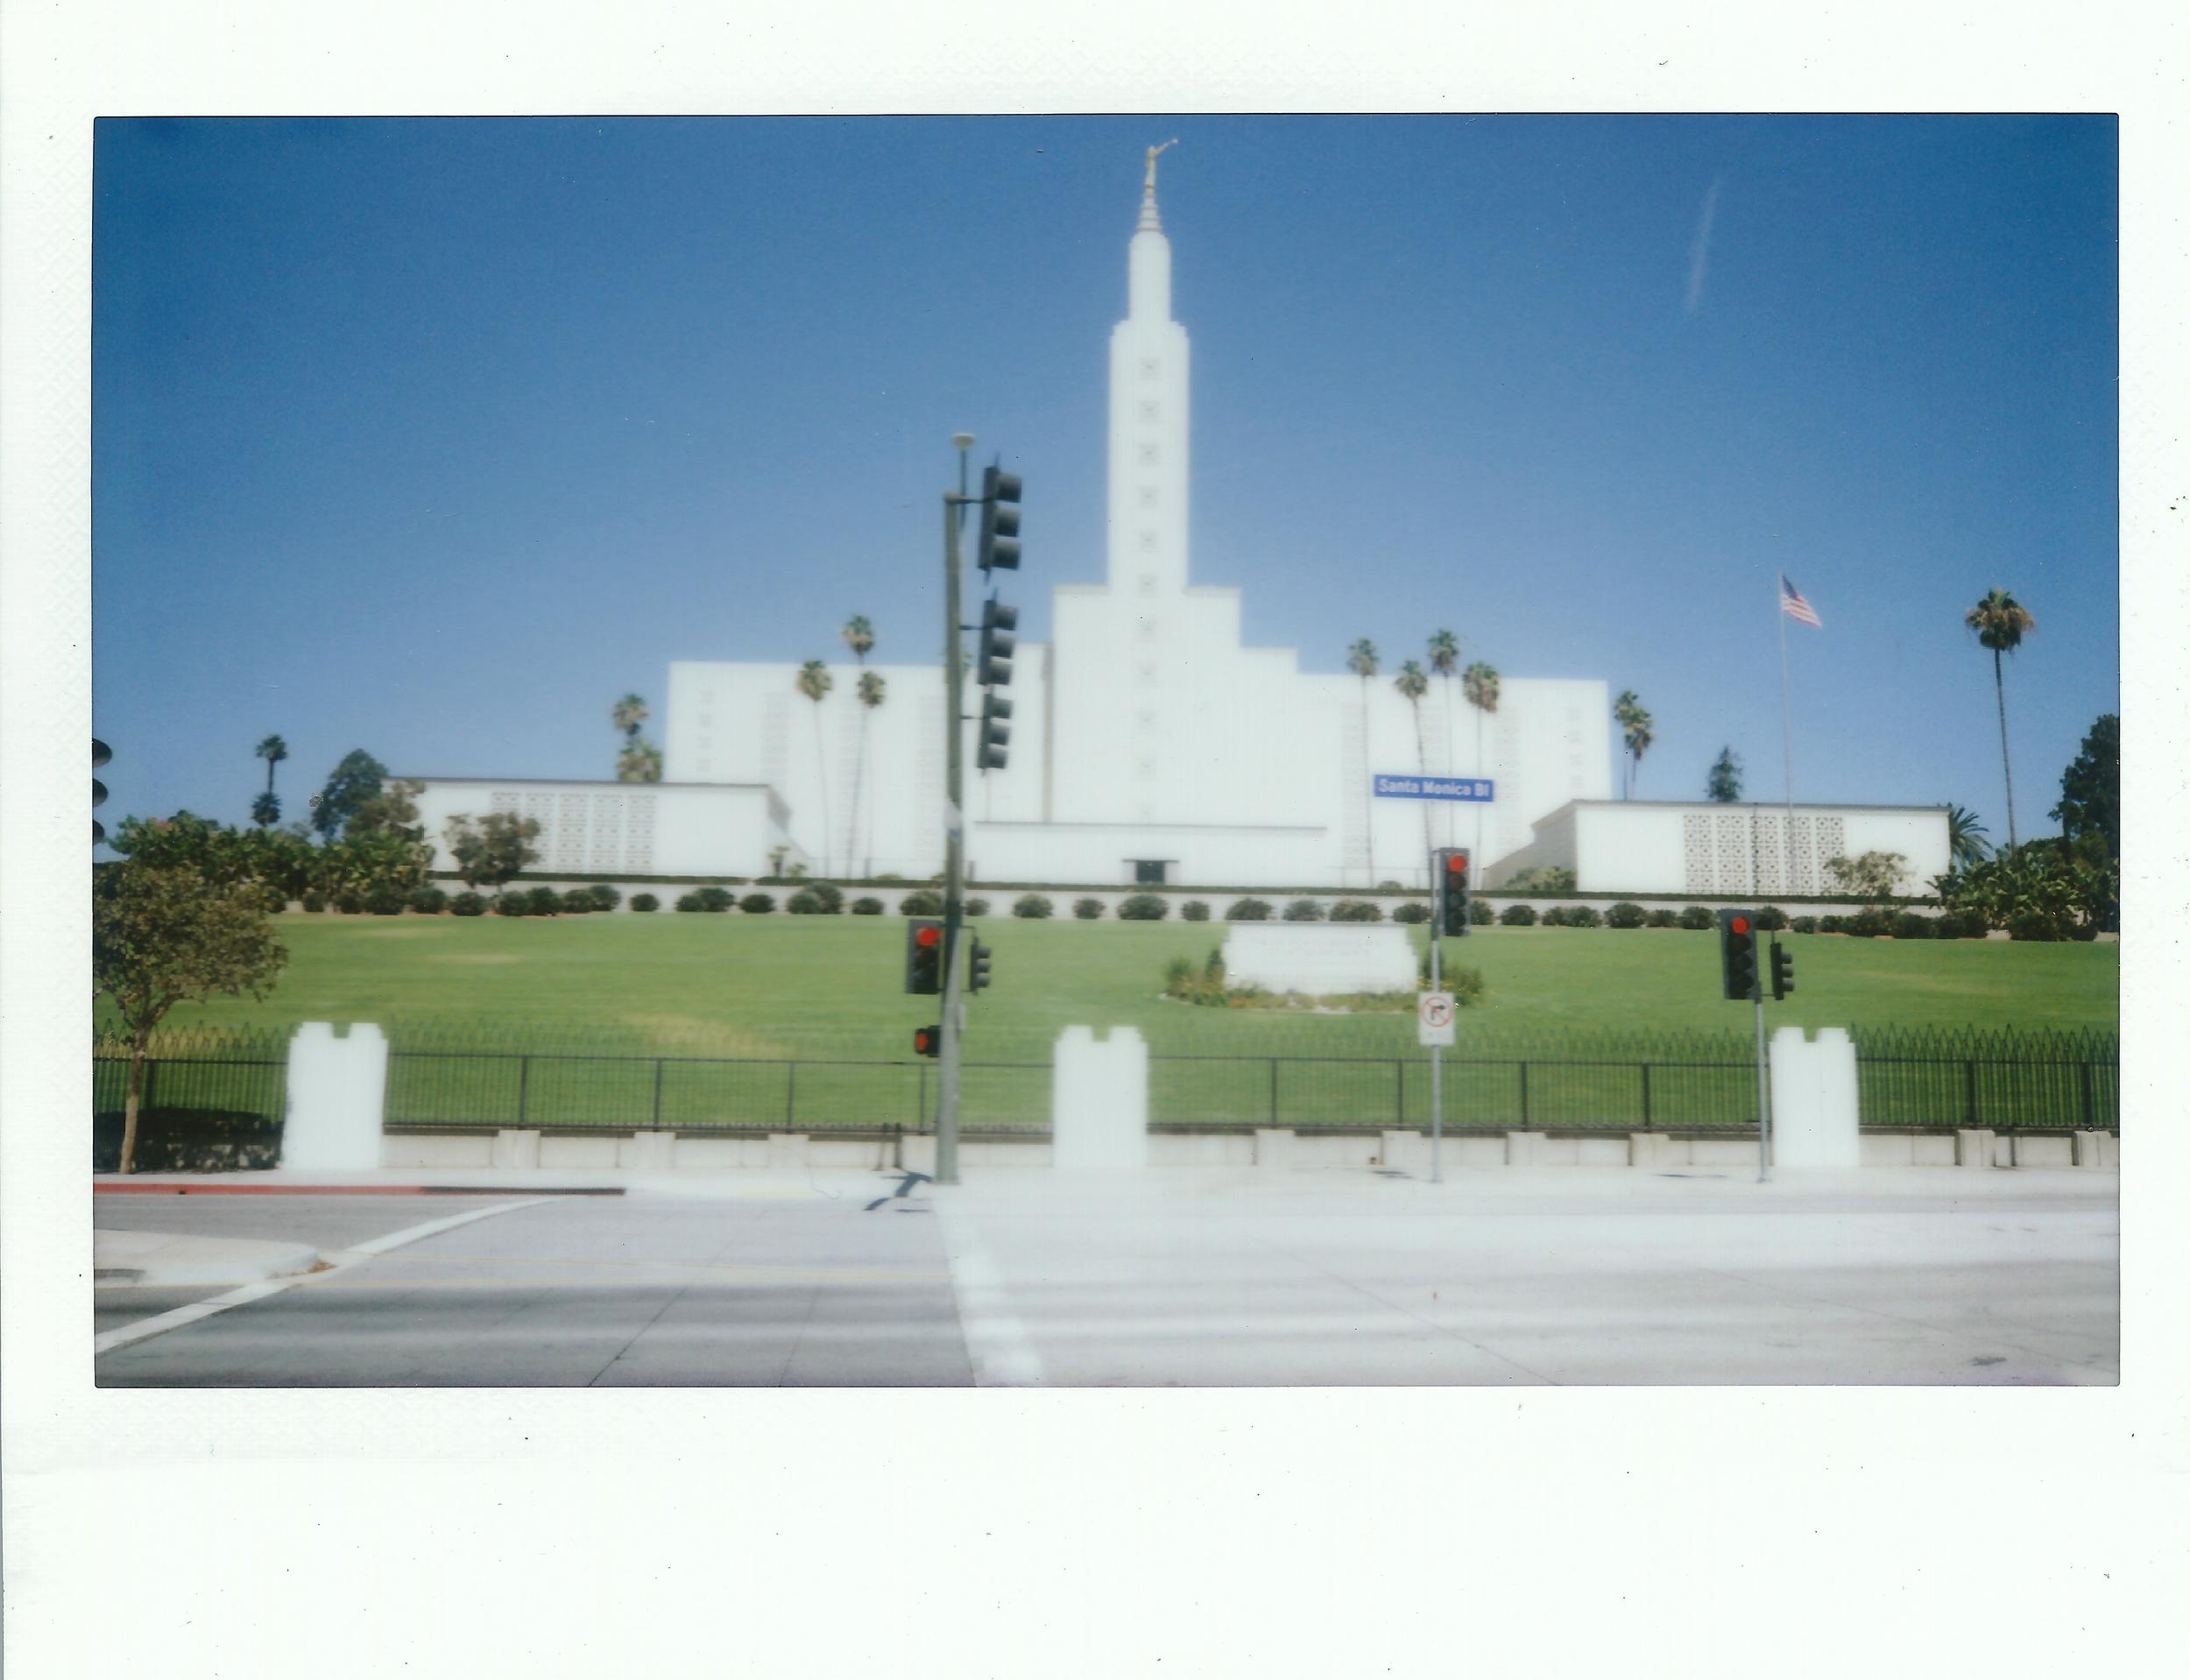 MormonChurchonSantaMonicaBlvd3.jpg